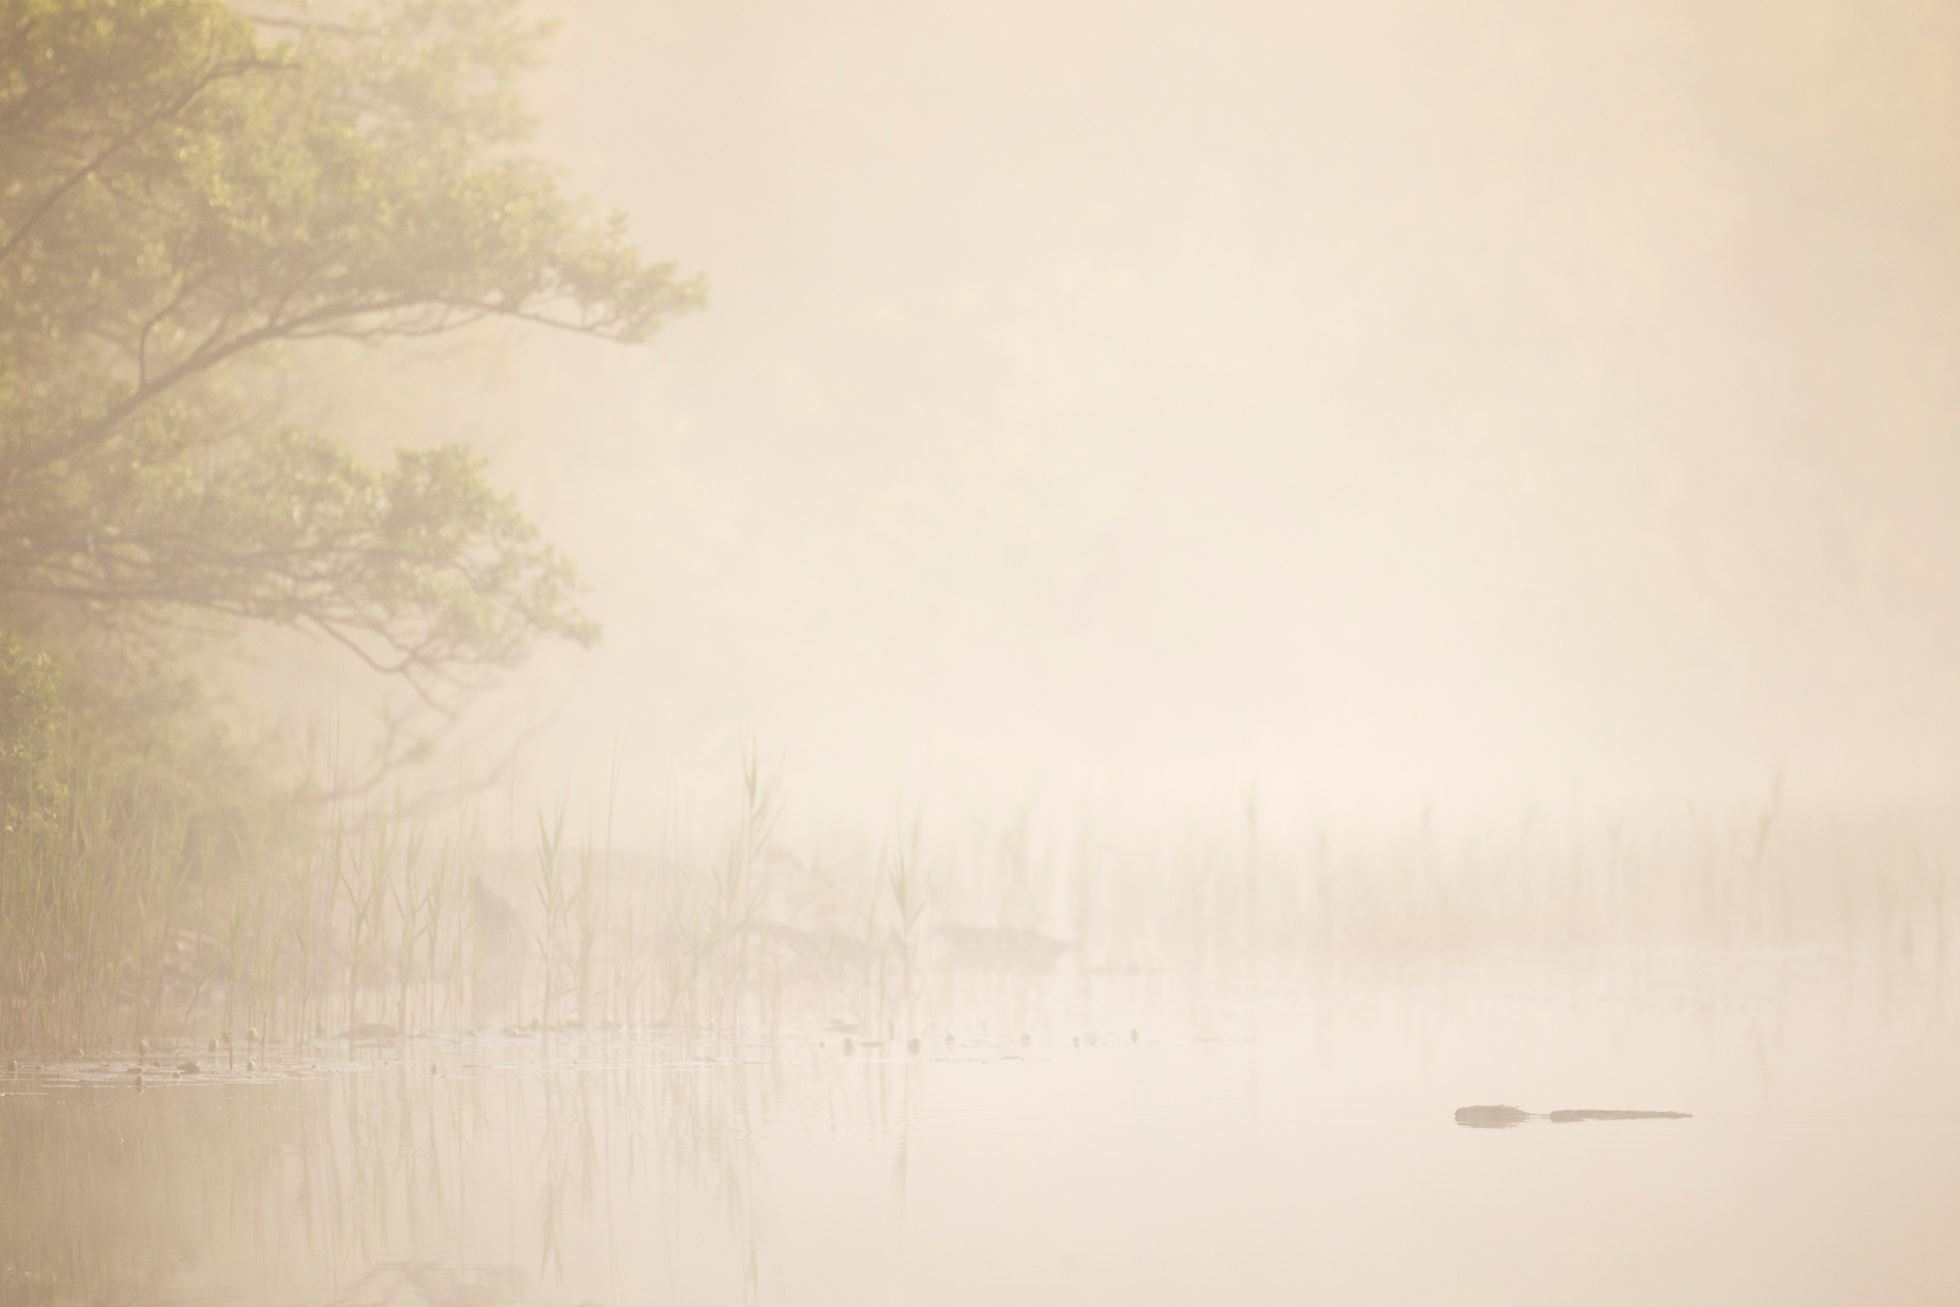 European beaver (Castor fiber) swimming at dawn, Argyll, Scotland.